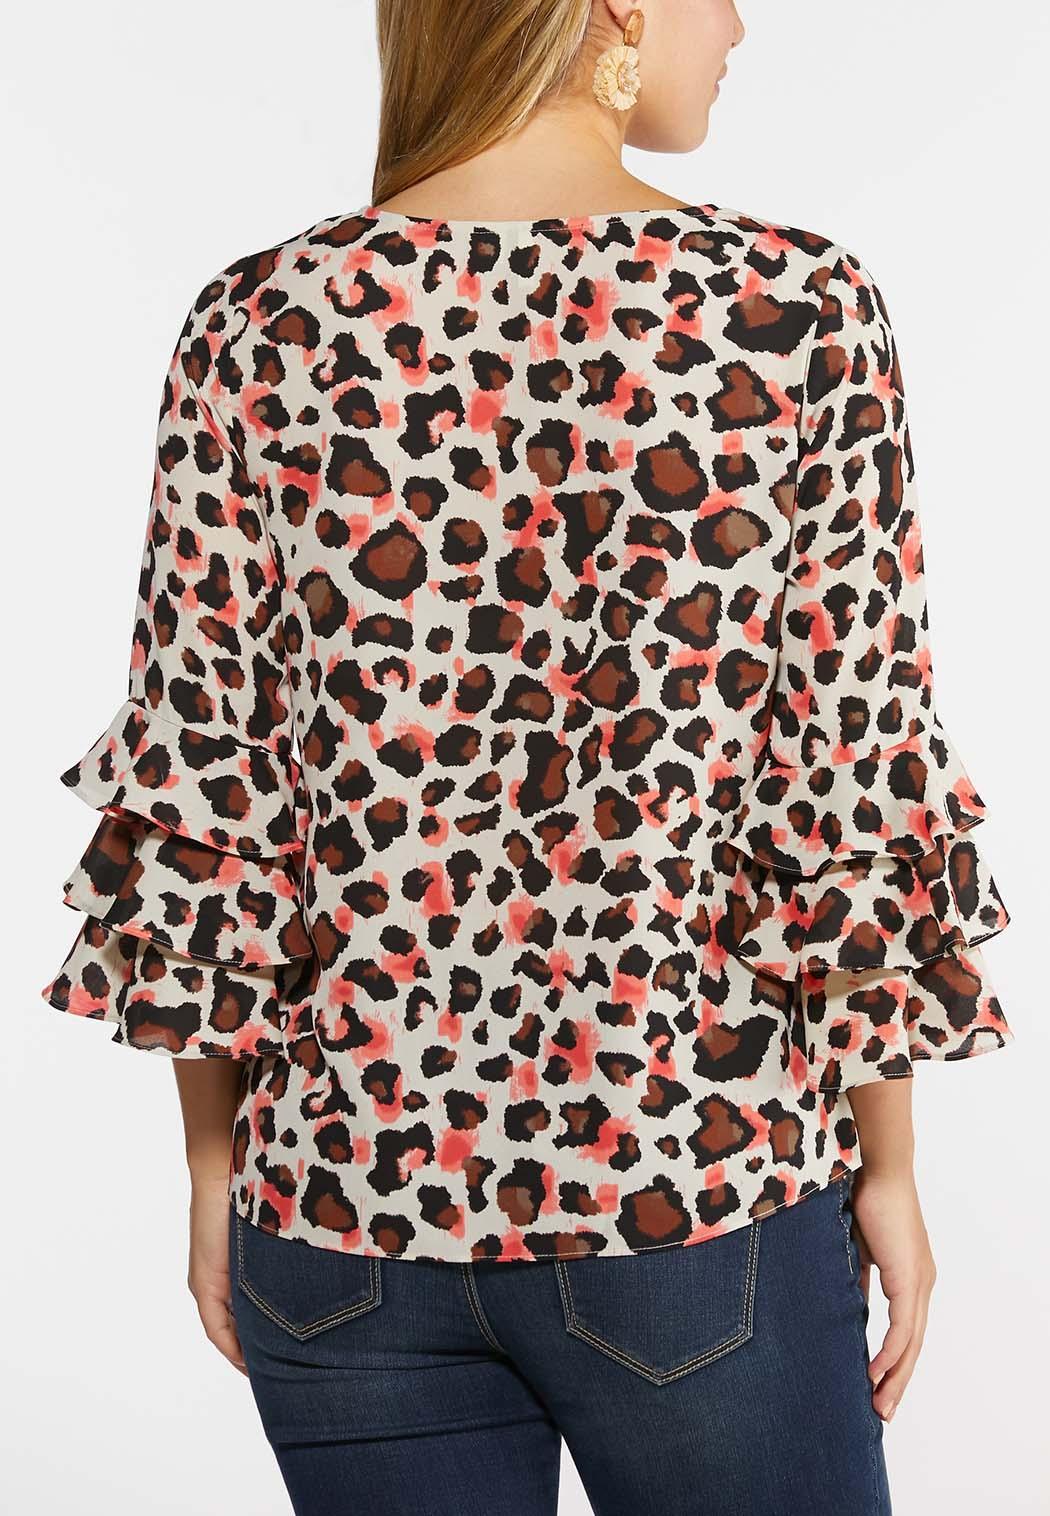 Blushing Leopard Print Top (Item #44336552)